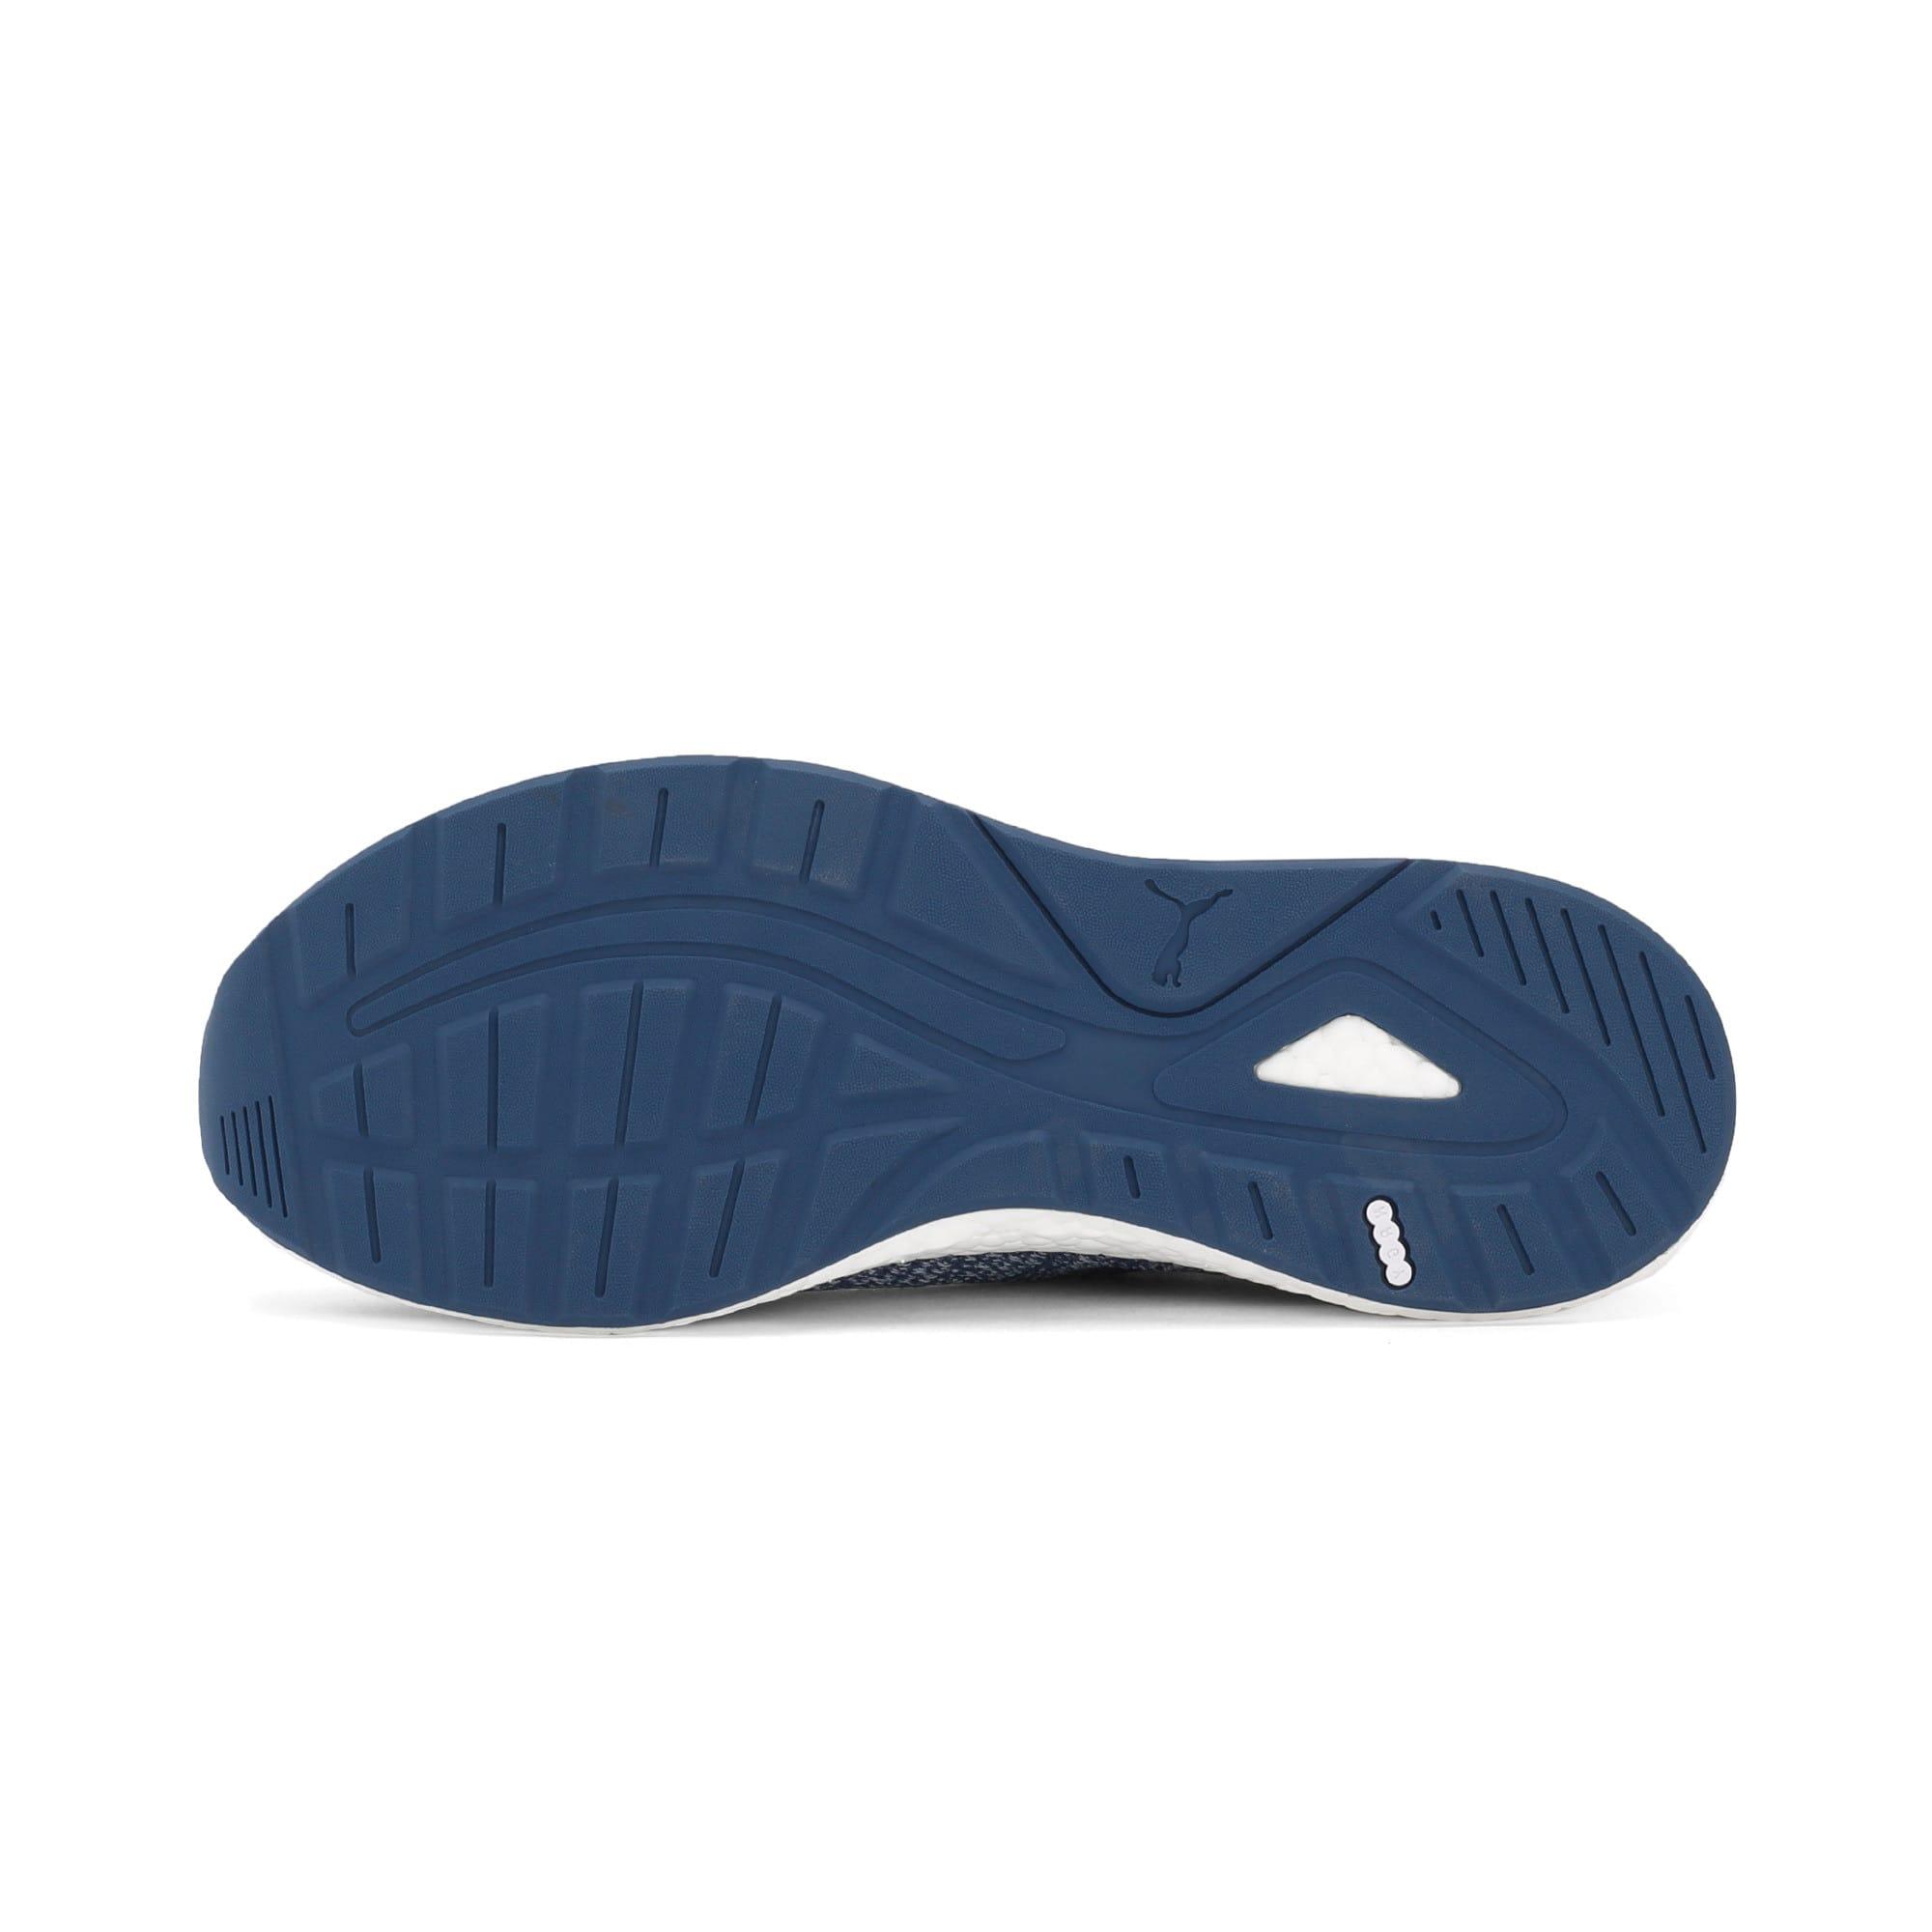 Thumbnail 4 of NRGY Neko Slip-On one8 Unisex Running Shoes, Dark Denim-Puma White, medium-IND